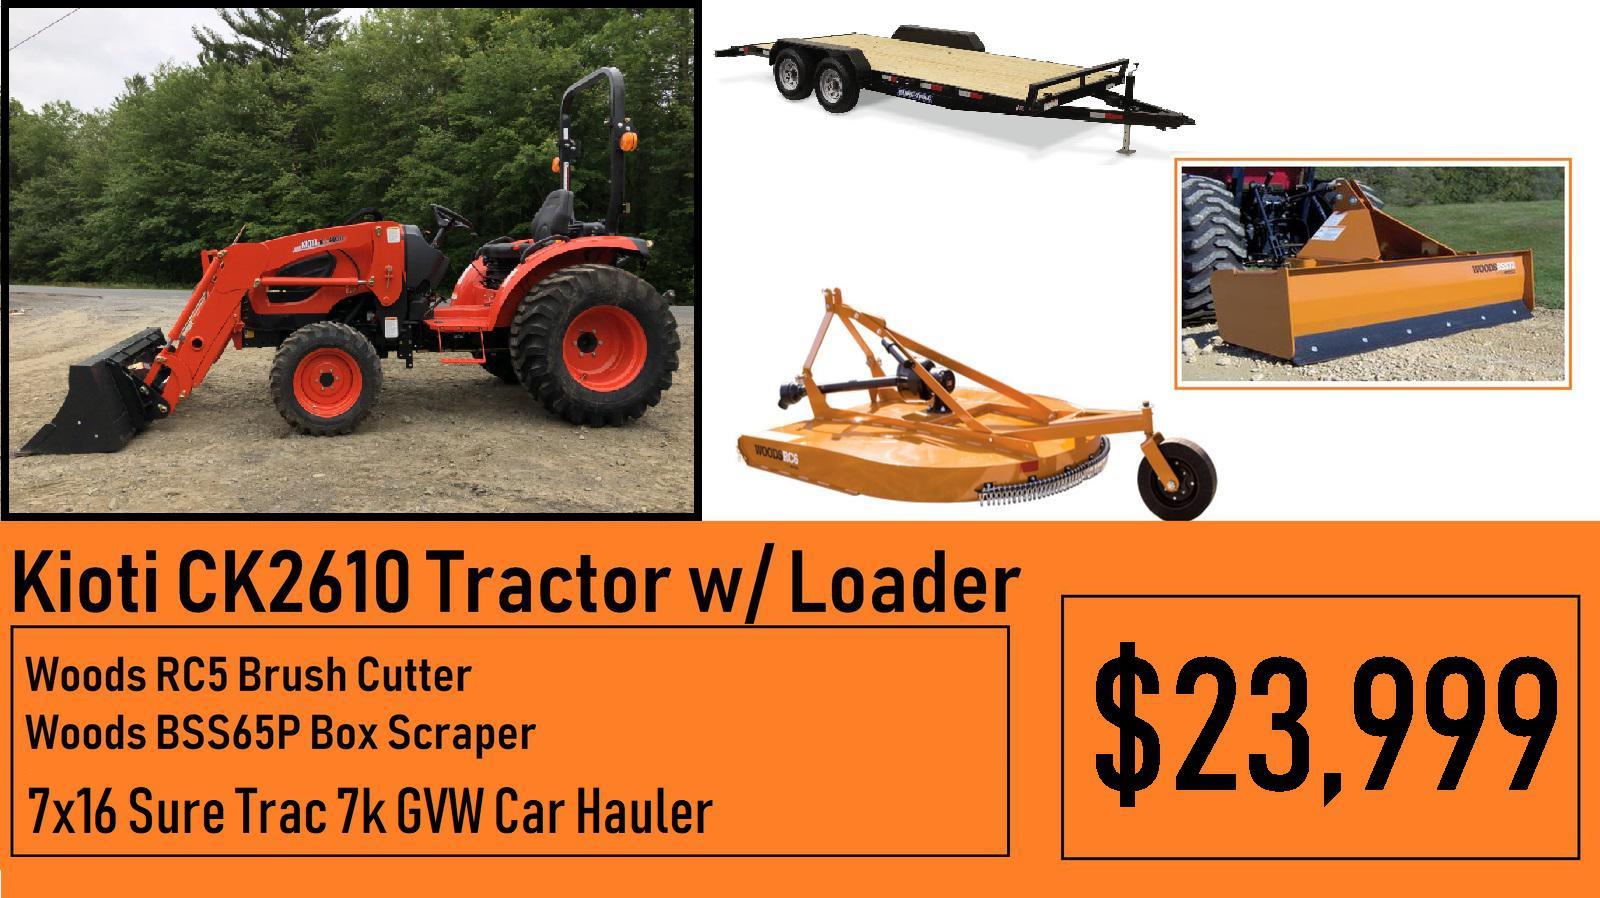 Kioti Kioti Package Deal #6 - Kioti CK2610 Tractor w/ Loader & 5ft Brush  hog, 65